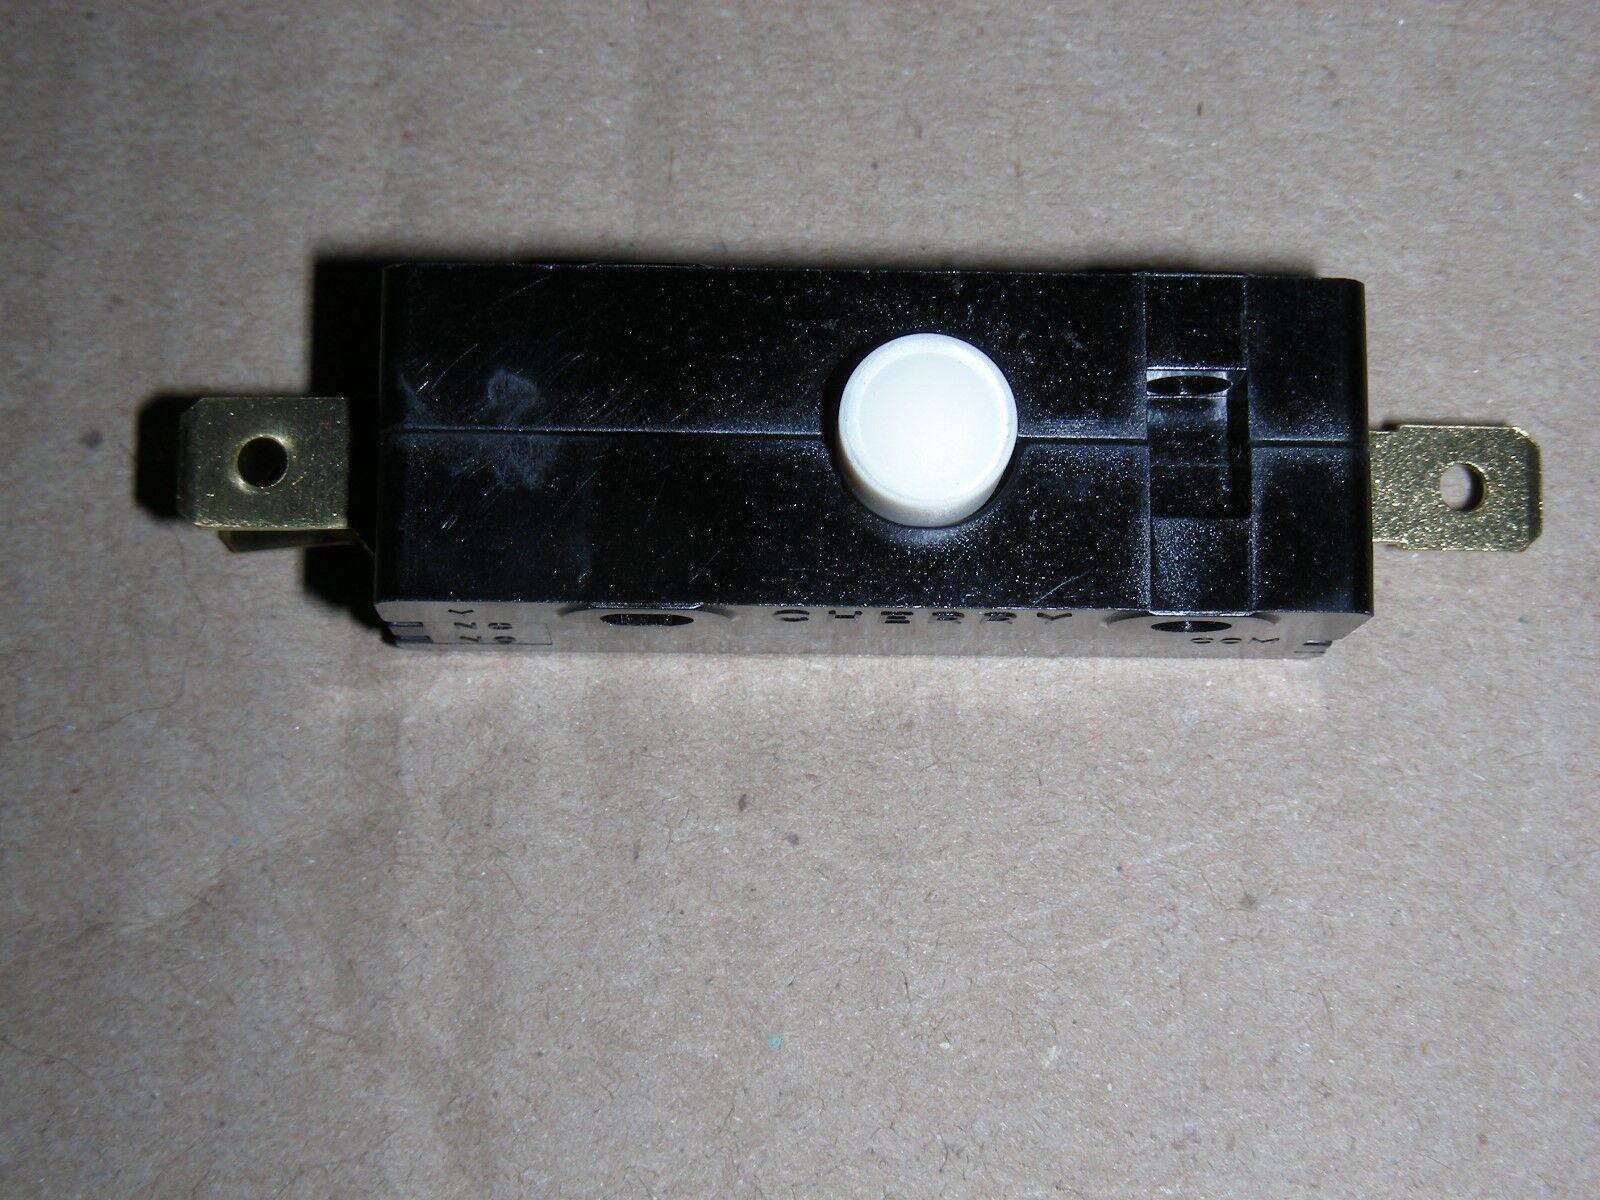 Sears Craftsman 63939 Rocker Switch /& Safety Key 60256 for many Radial Arm Saws